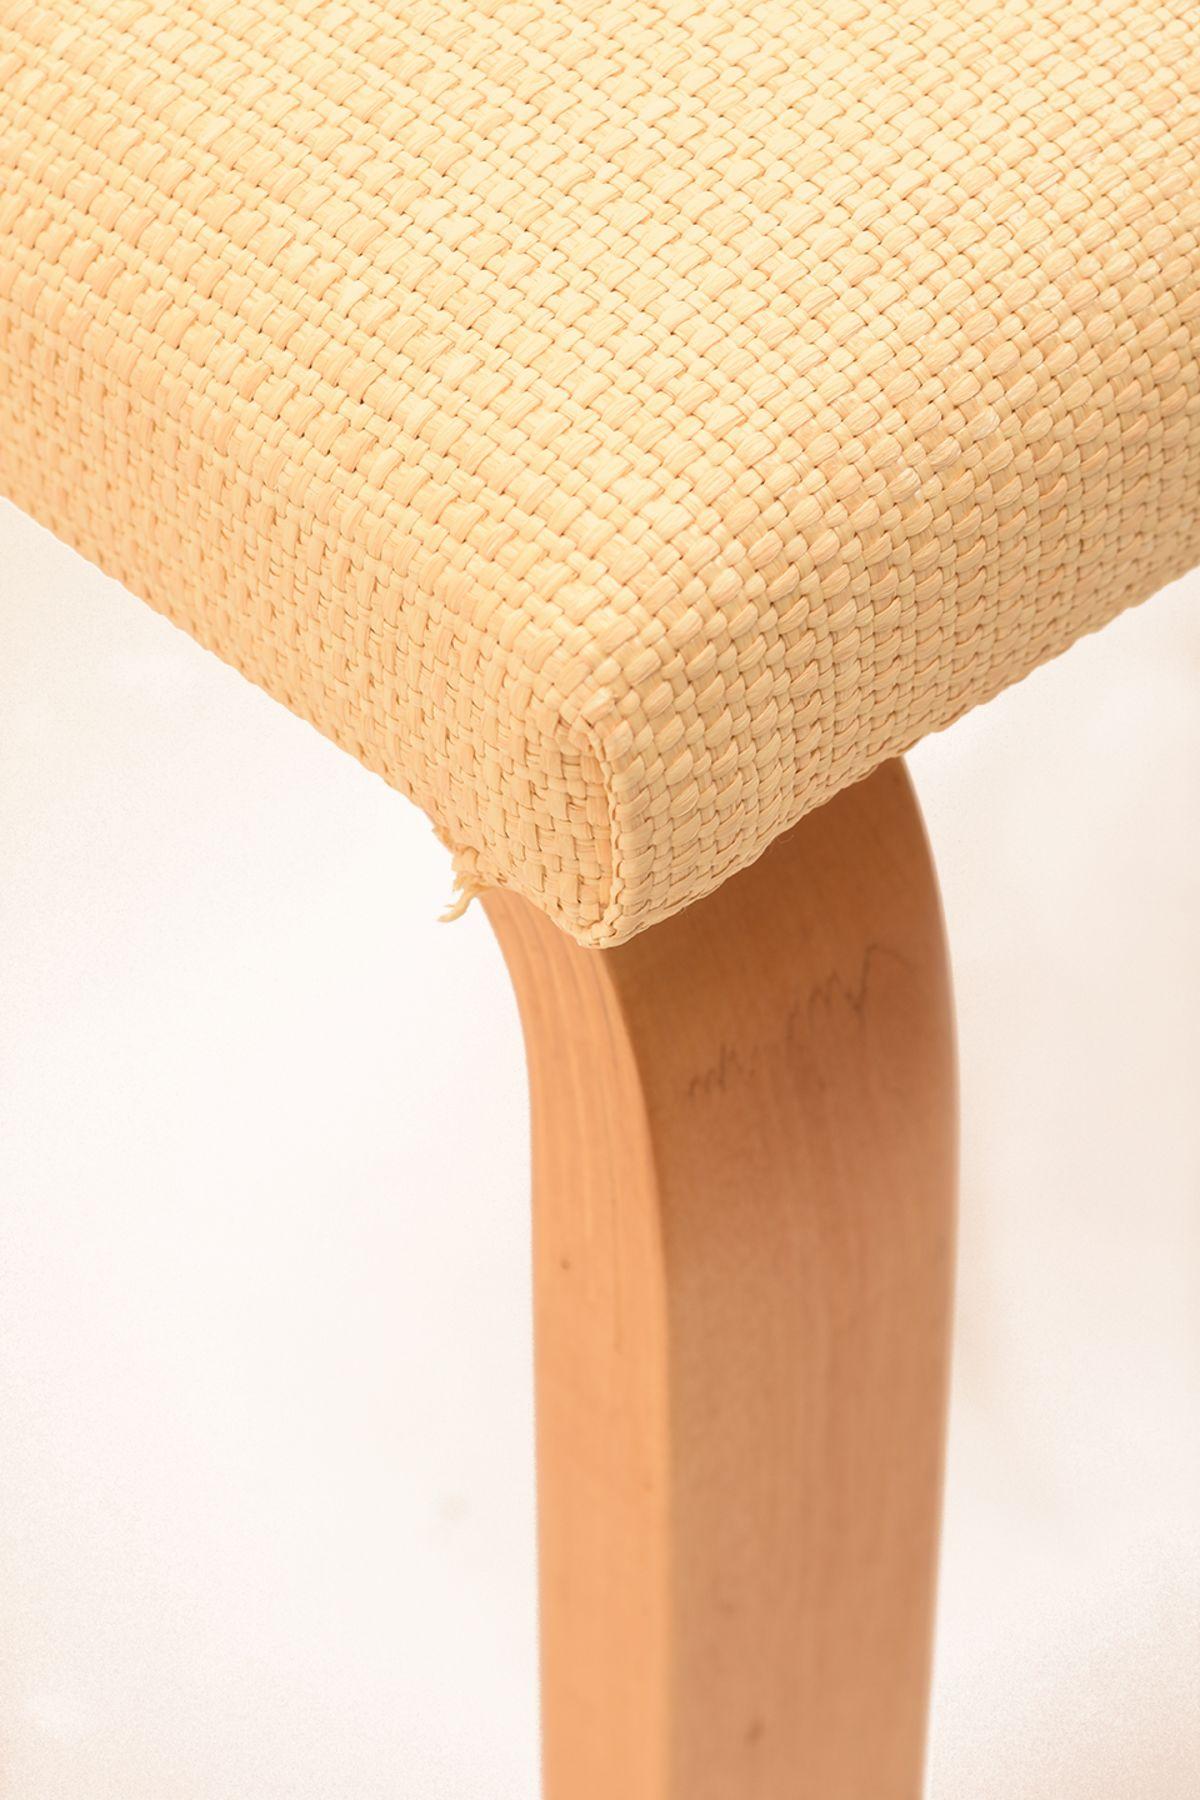 Alvar-Aalto_Bench-A_Detail-01